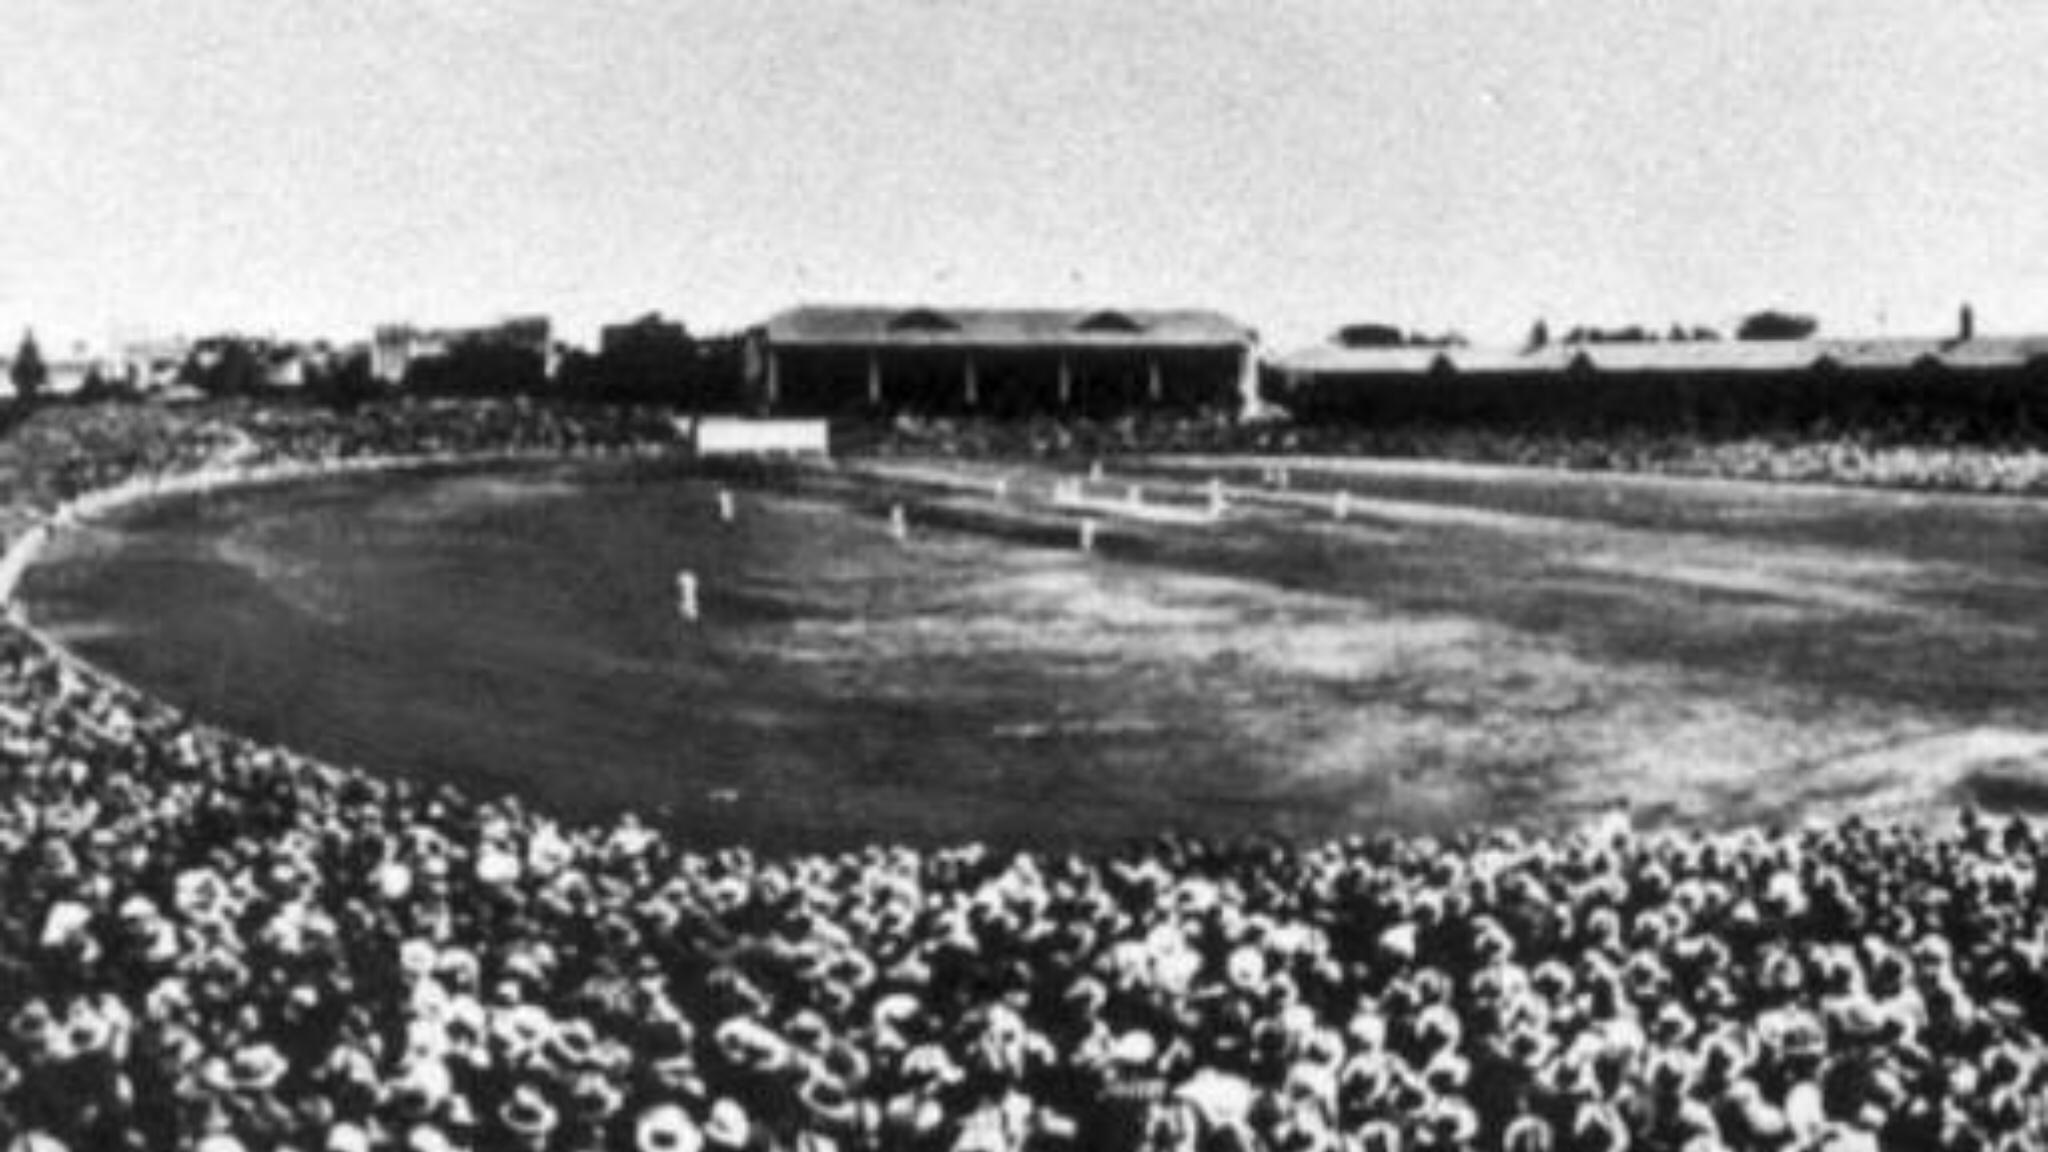 1933 cricket crowd